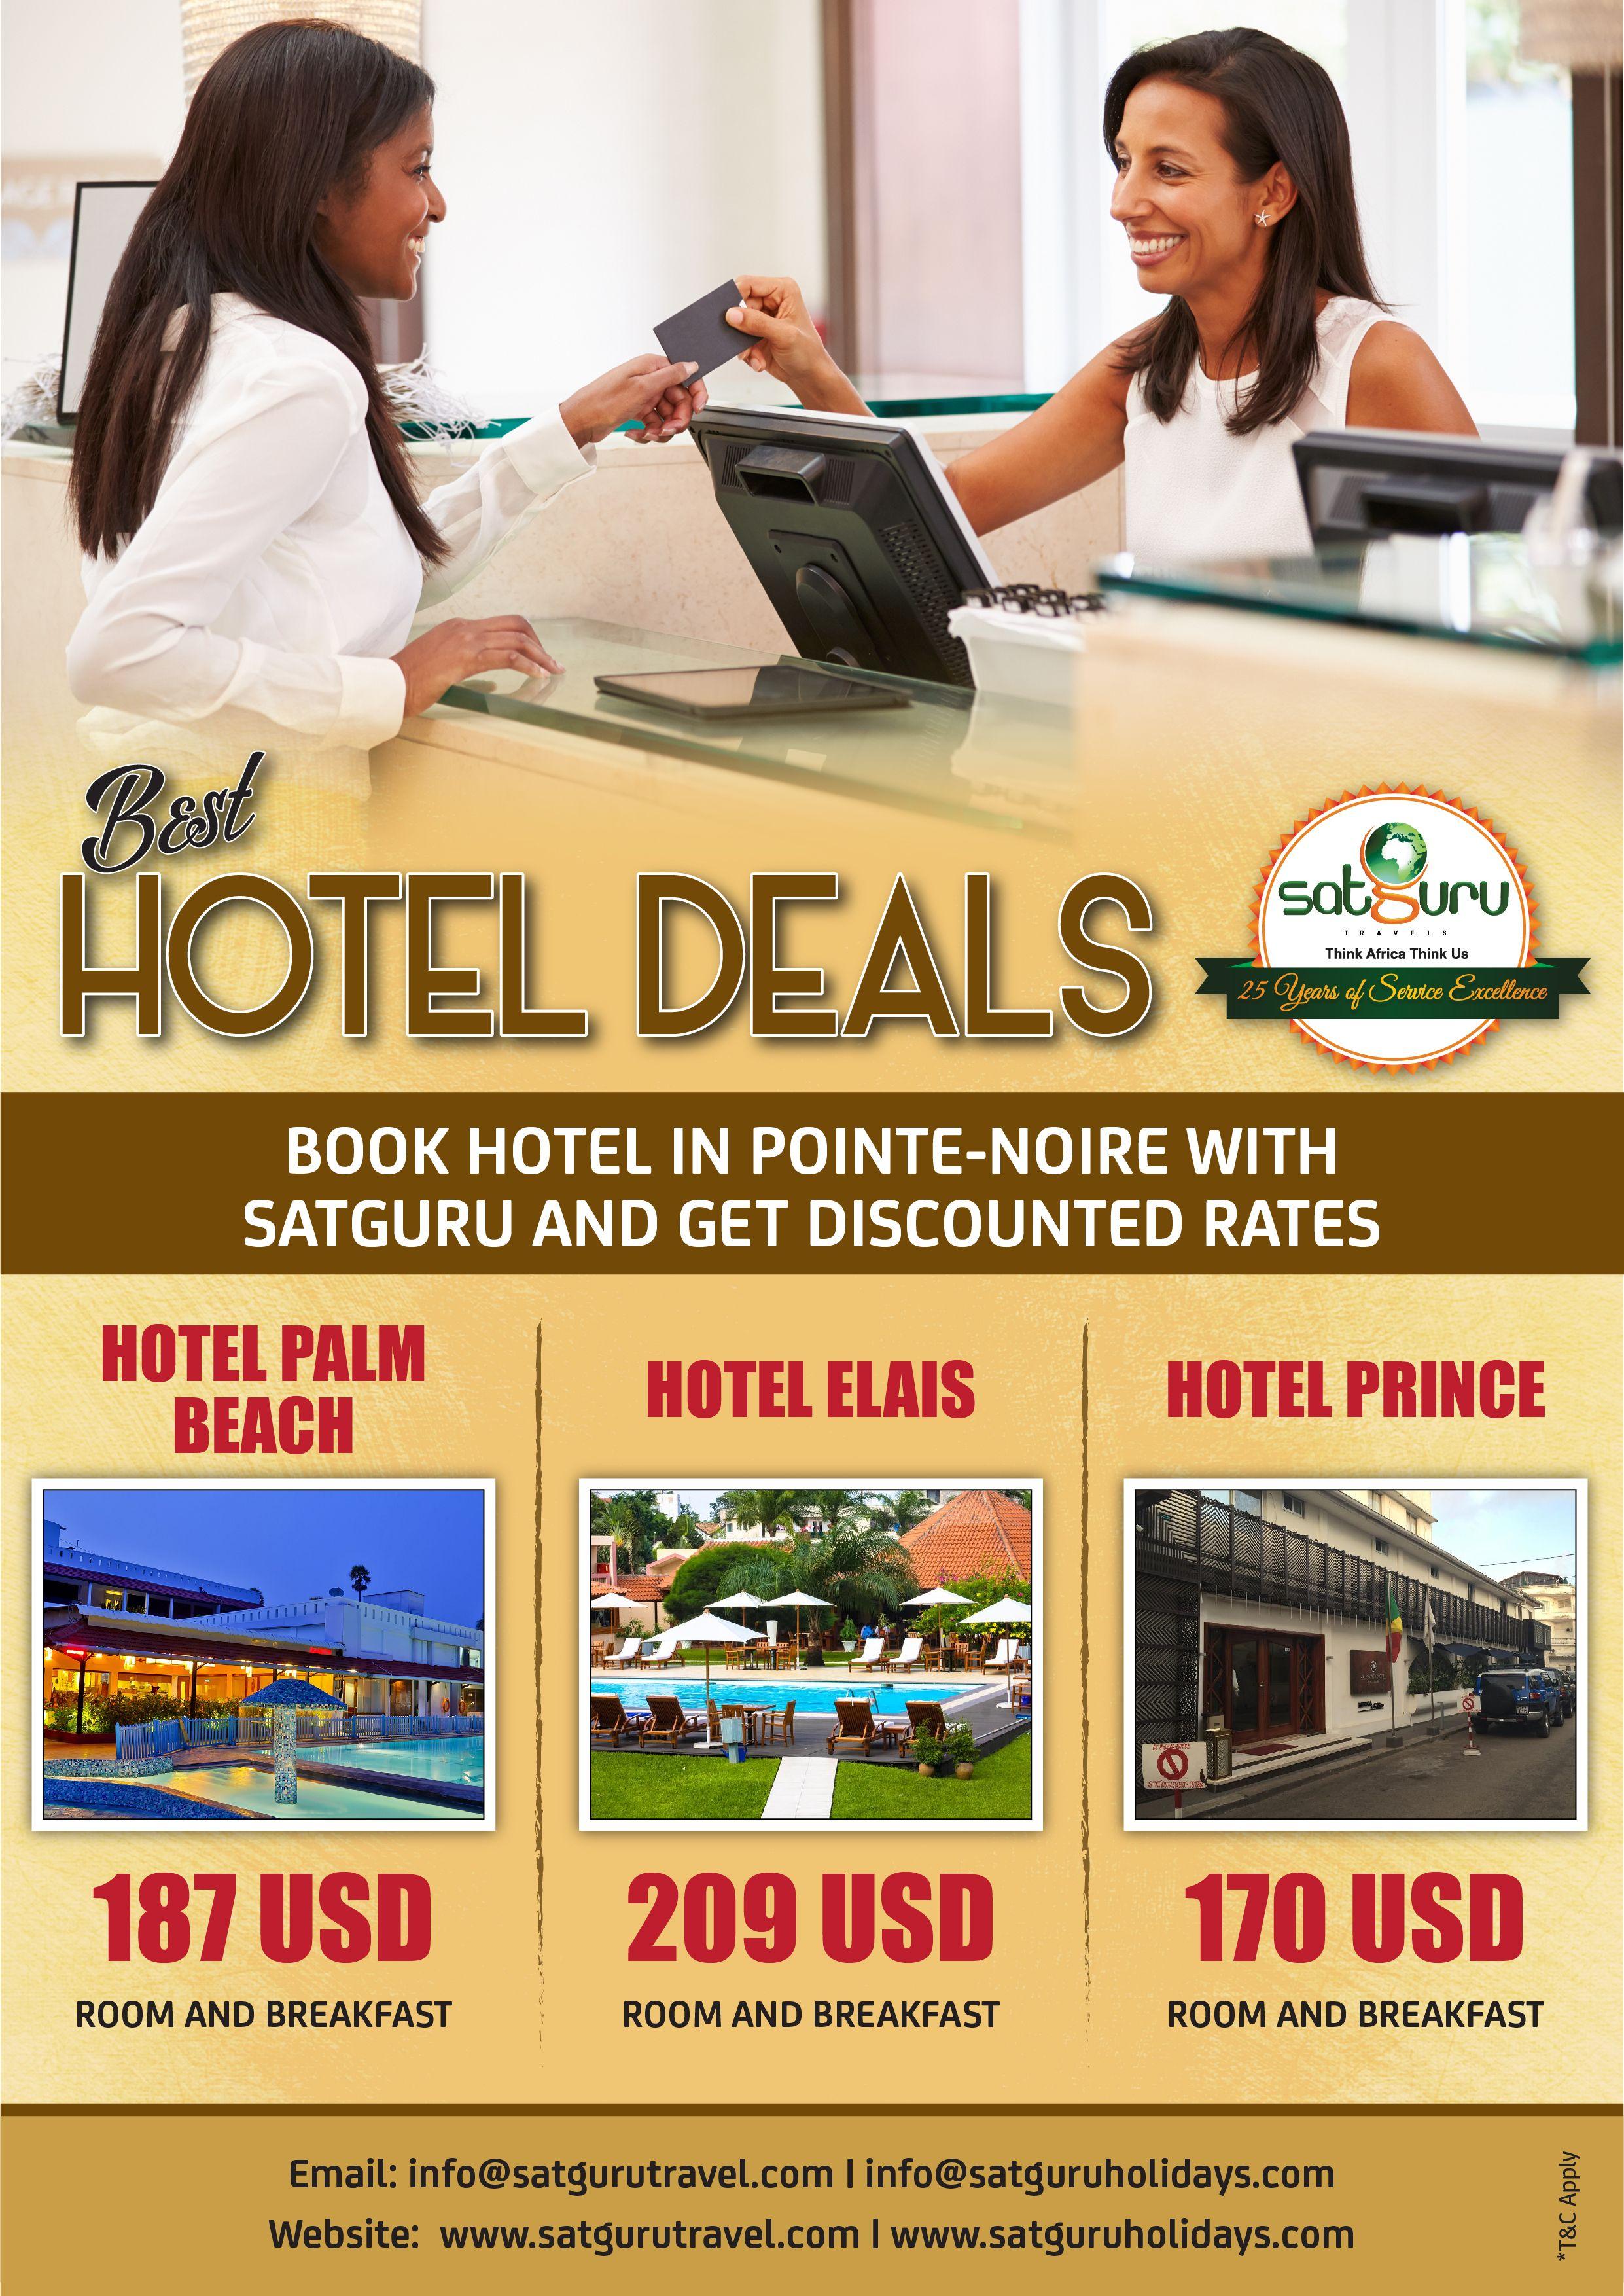 Best Hotel Deals In Pointe Noire Hotels Pointenoire Travel Tourism Best Hotel Deals Best Hotels Booking Hotel